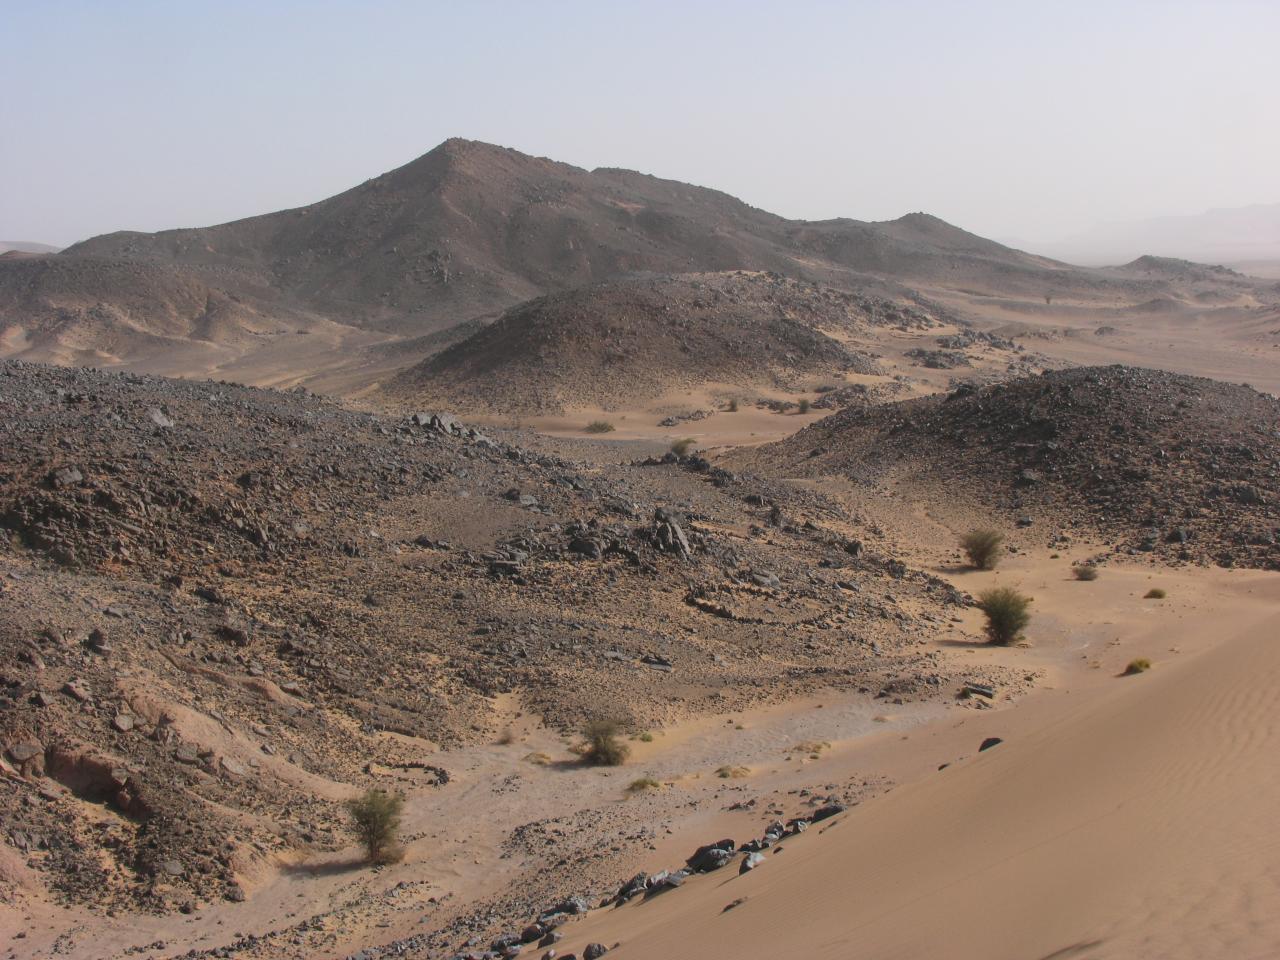 Fossiles Serdghar